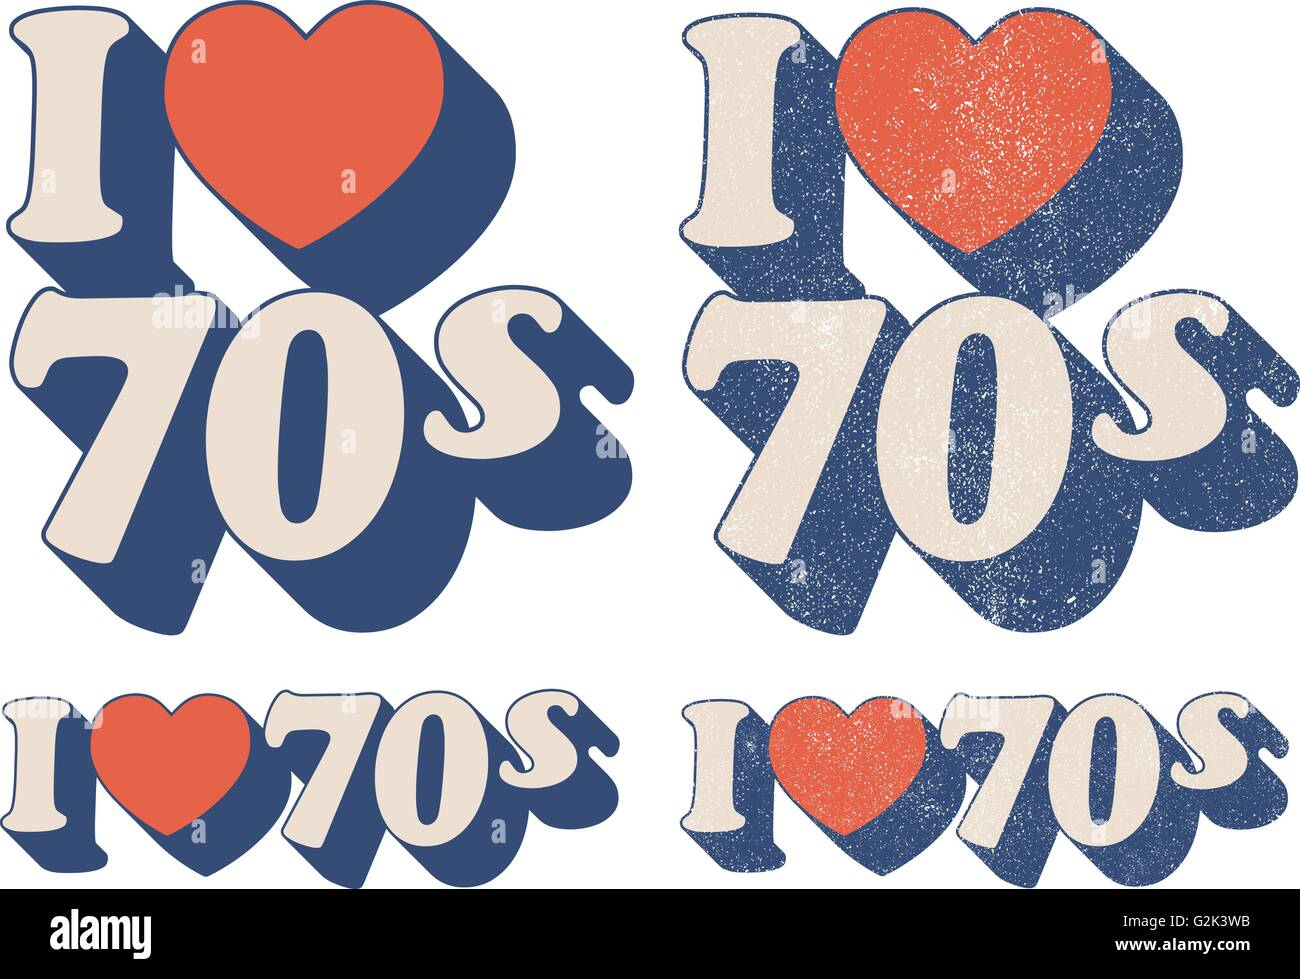 Io amo 70s Immagini Stock